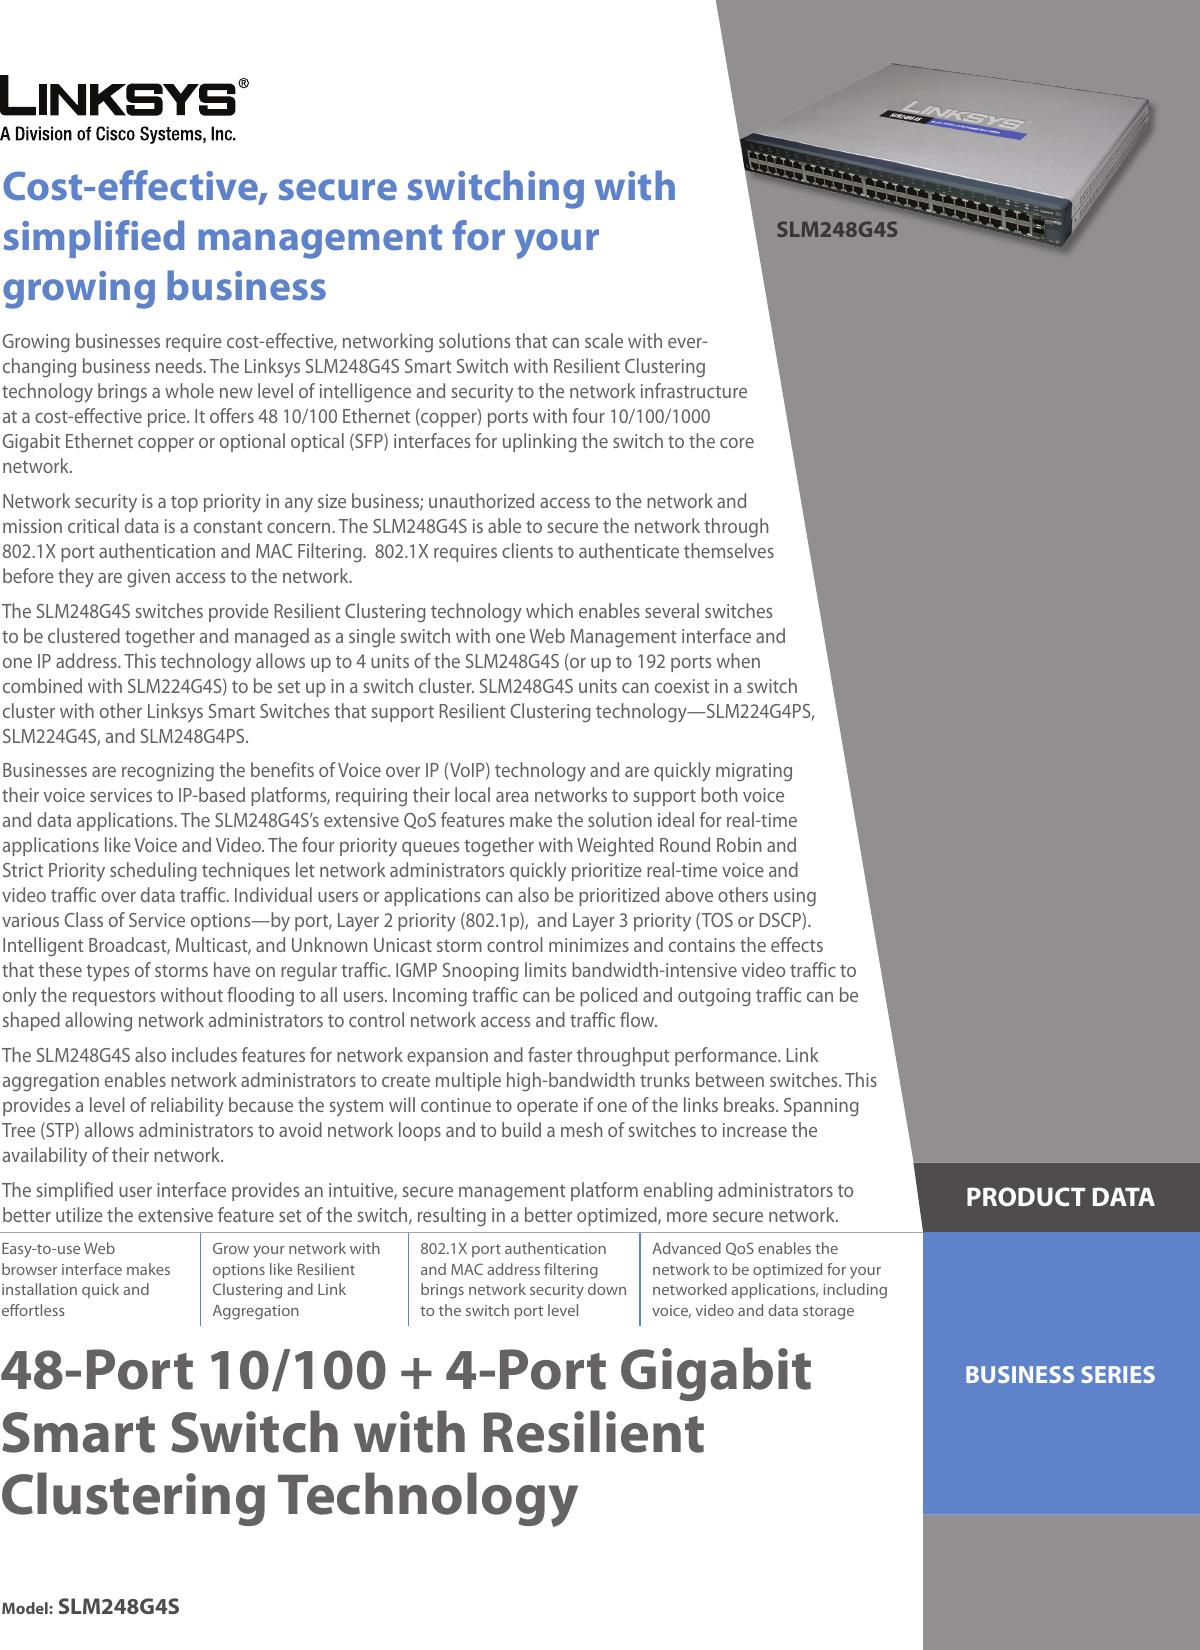 Linksys Slm248G4S Users Manual 48 Port 10/100 + 4 Gigabit